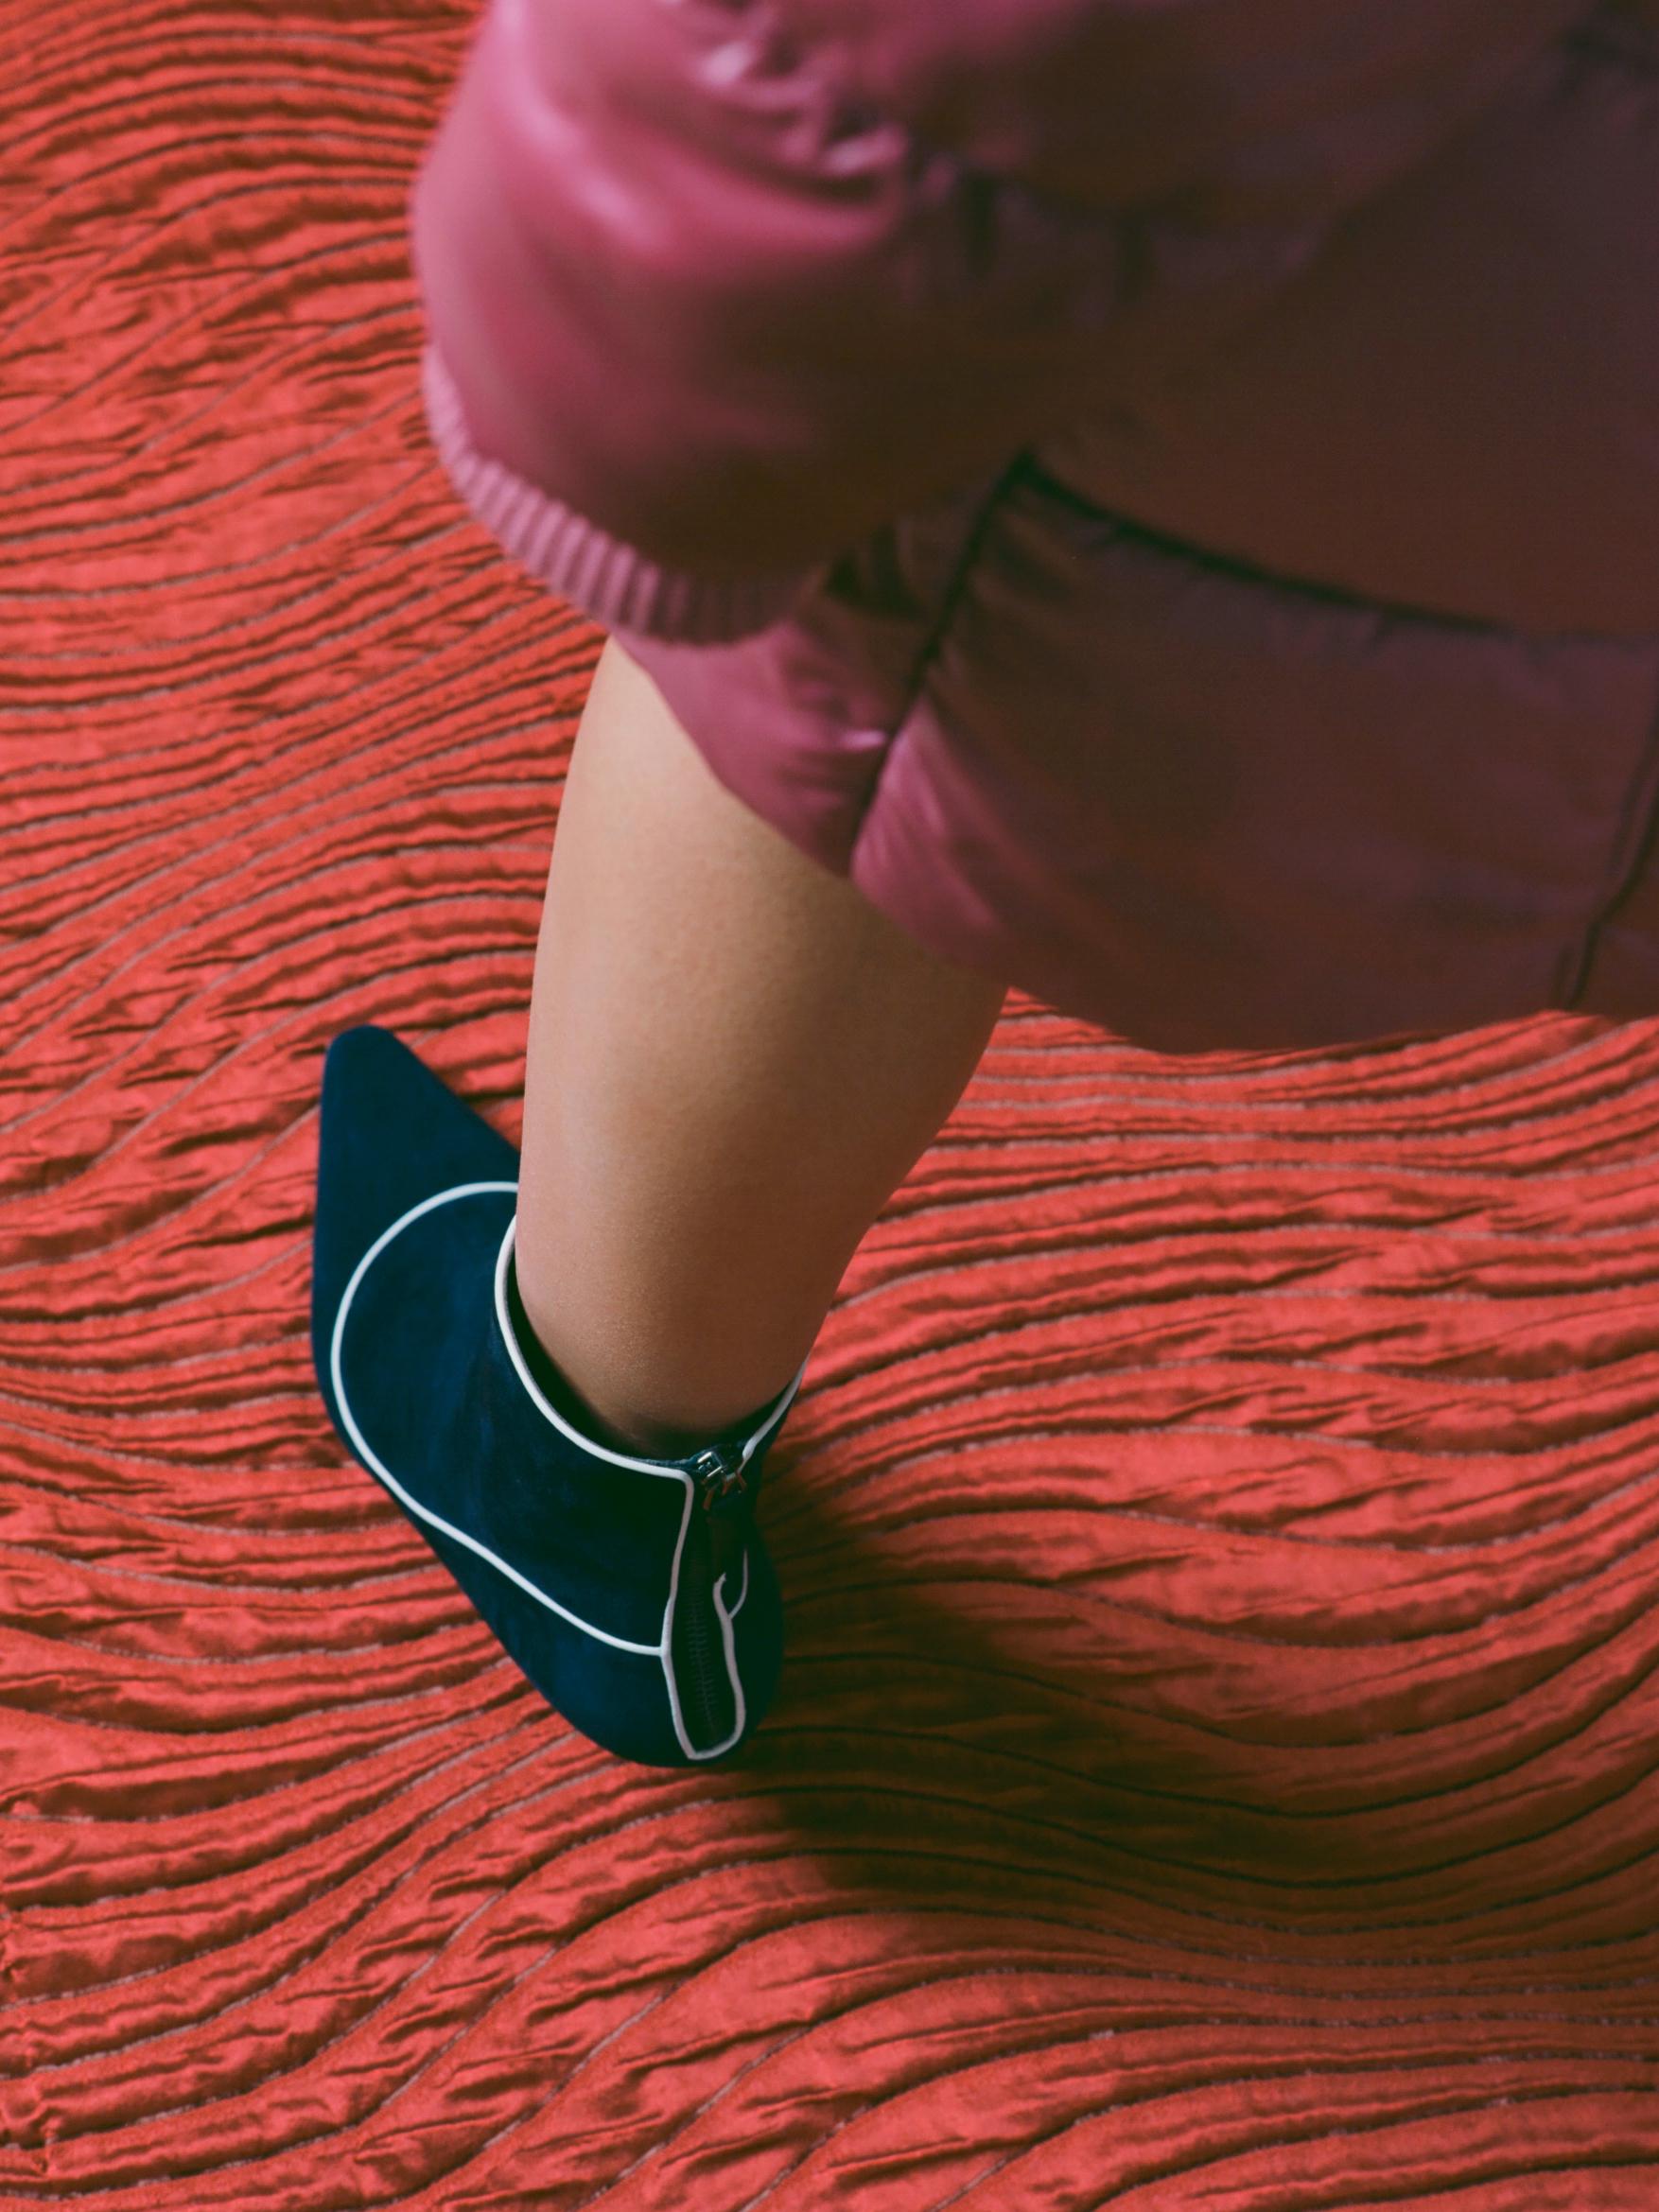 RED-LEG-BOOT.jpg